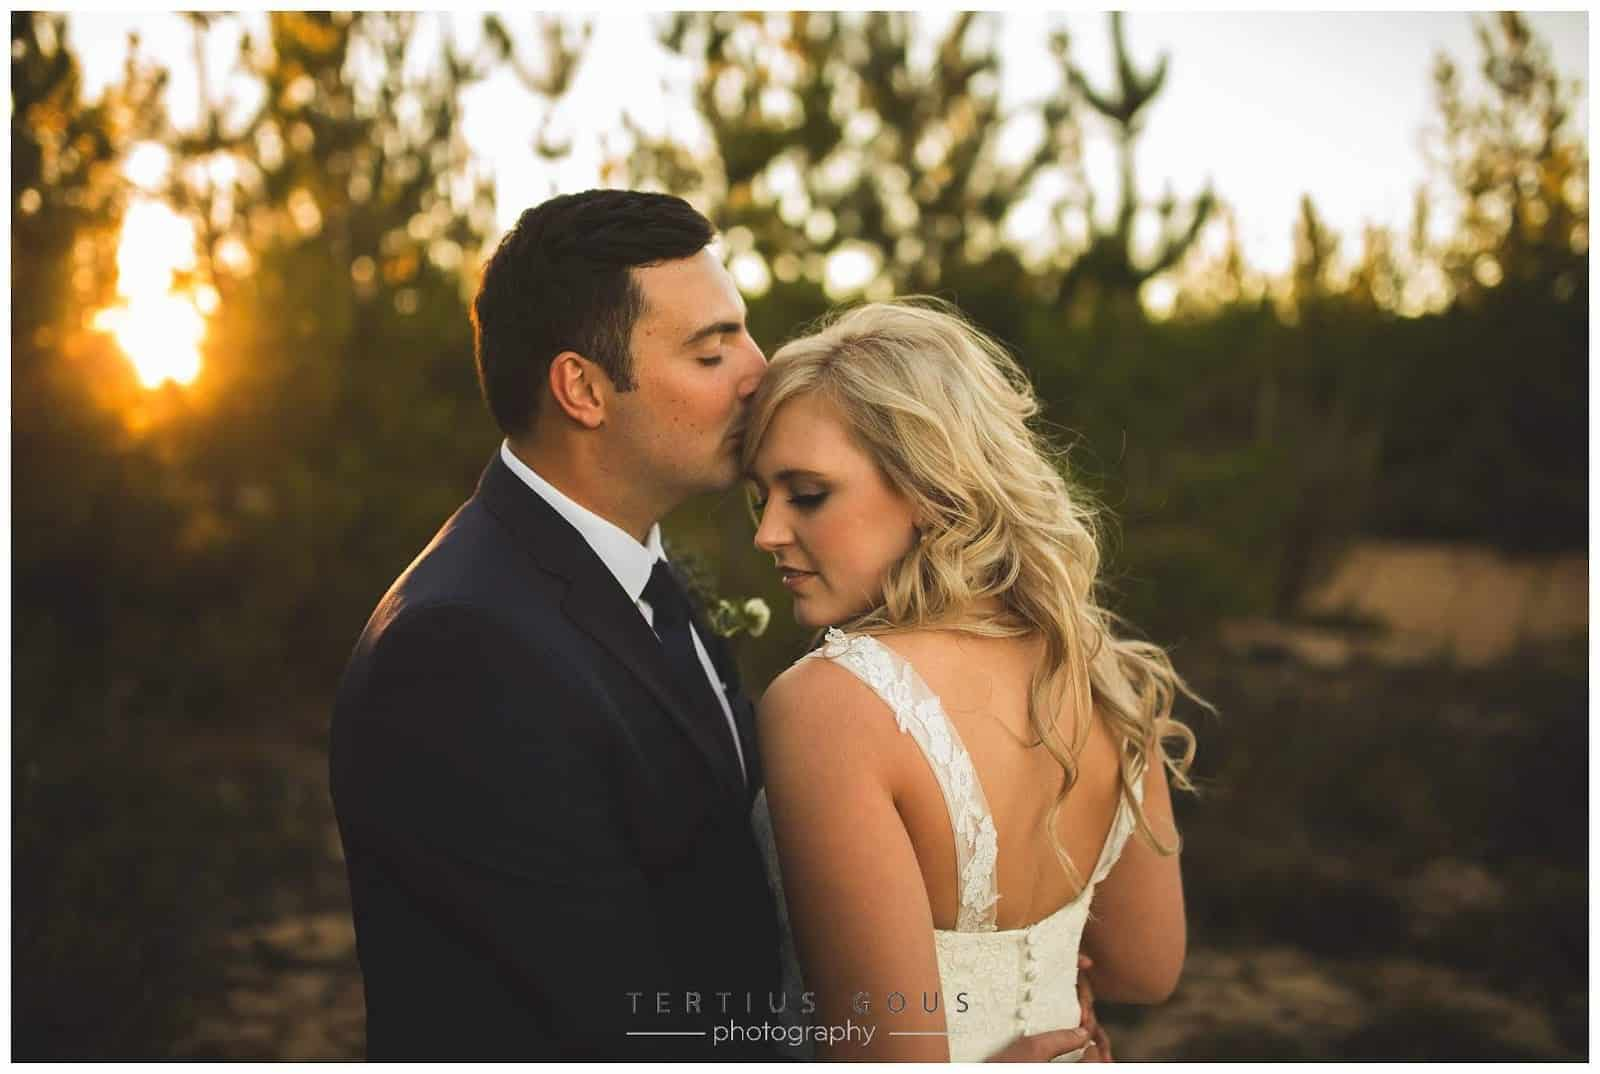 beautiful-couple-in-nature-tertius-gous-wedding-photographer-003